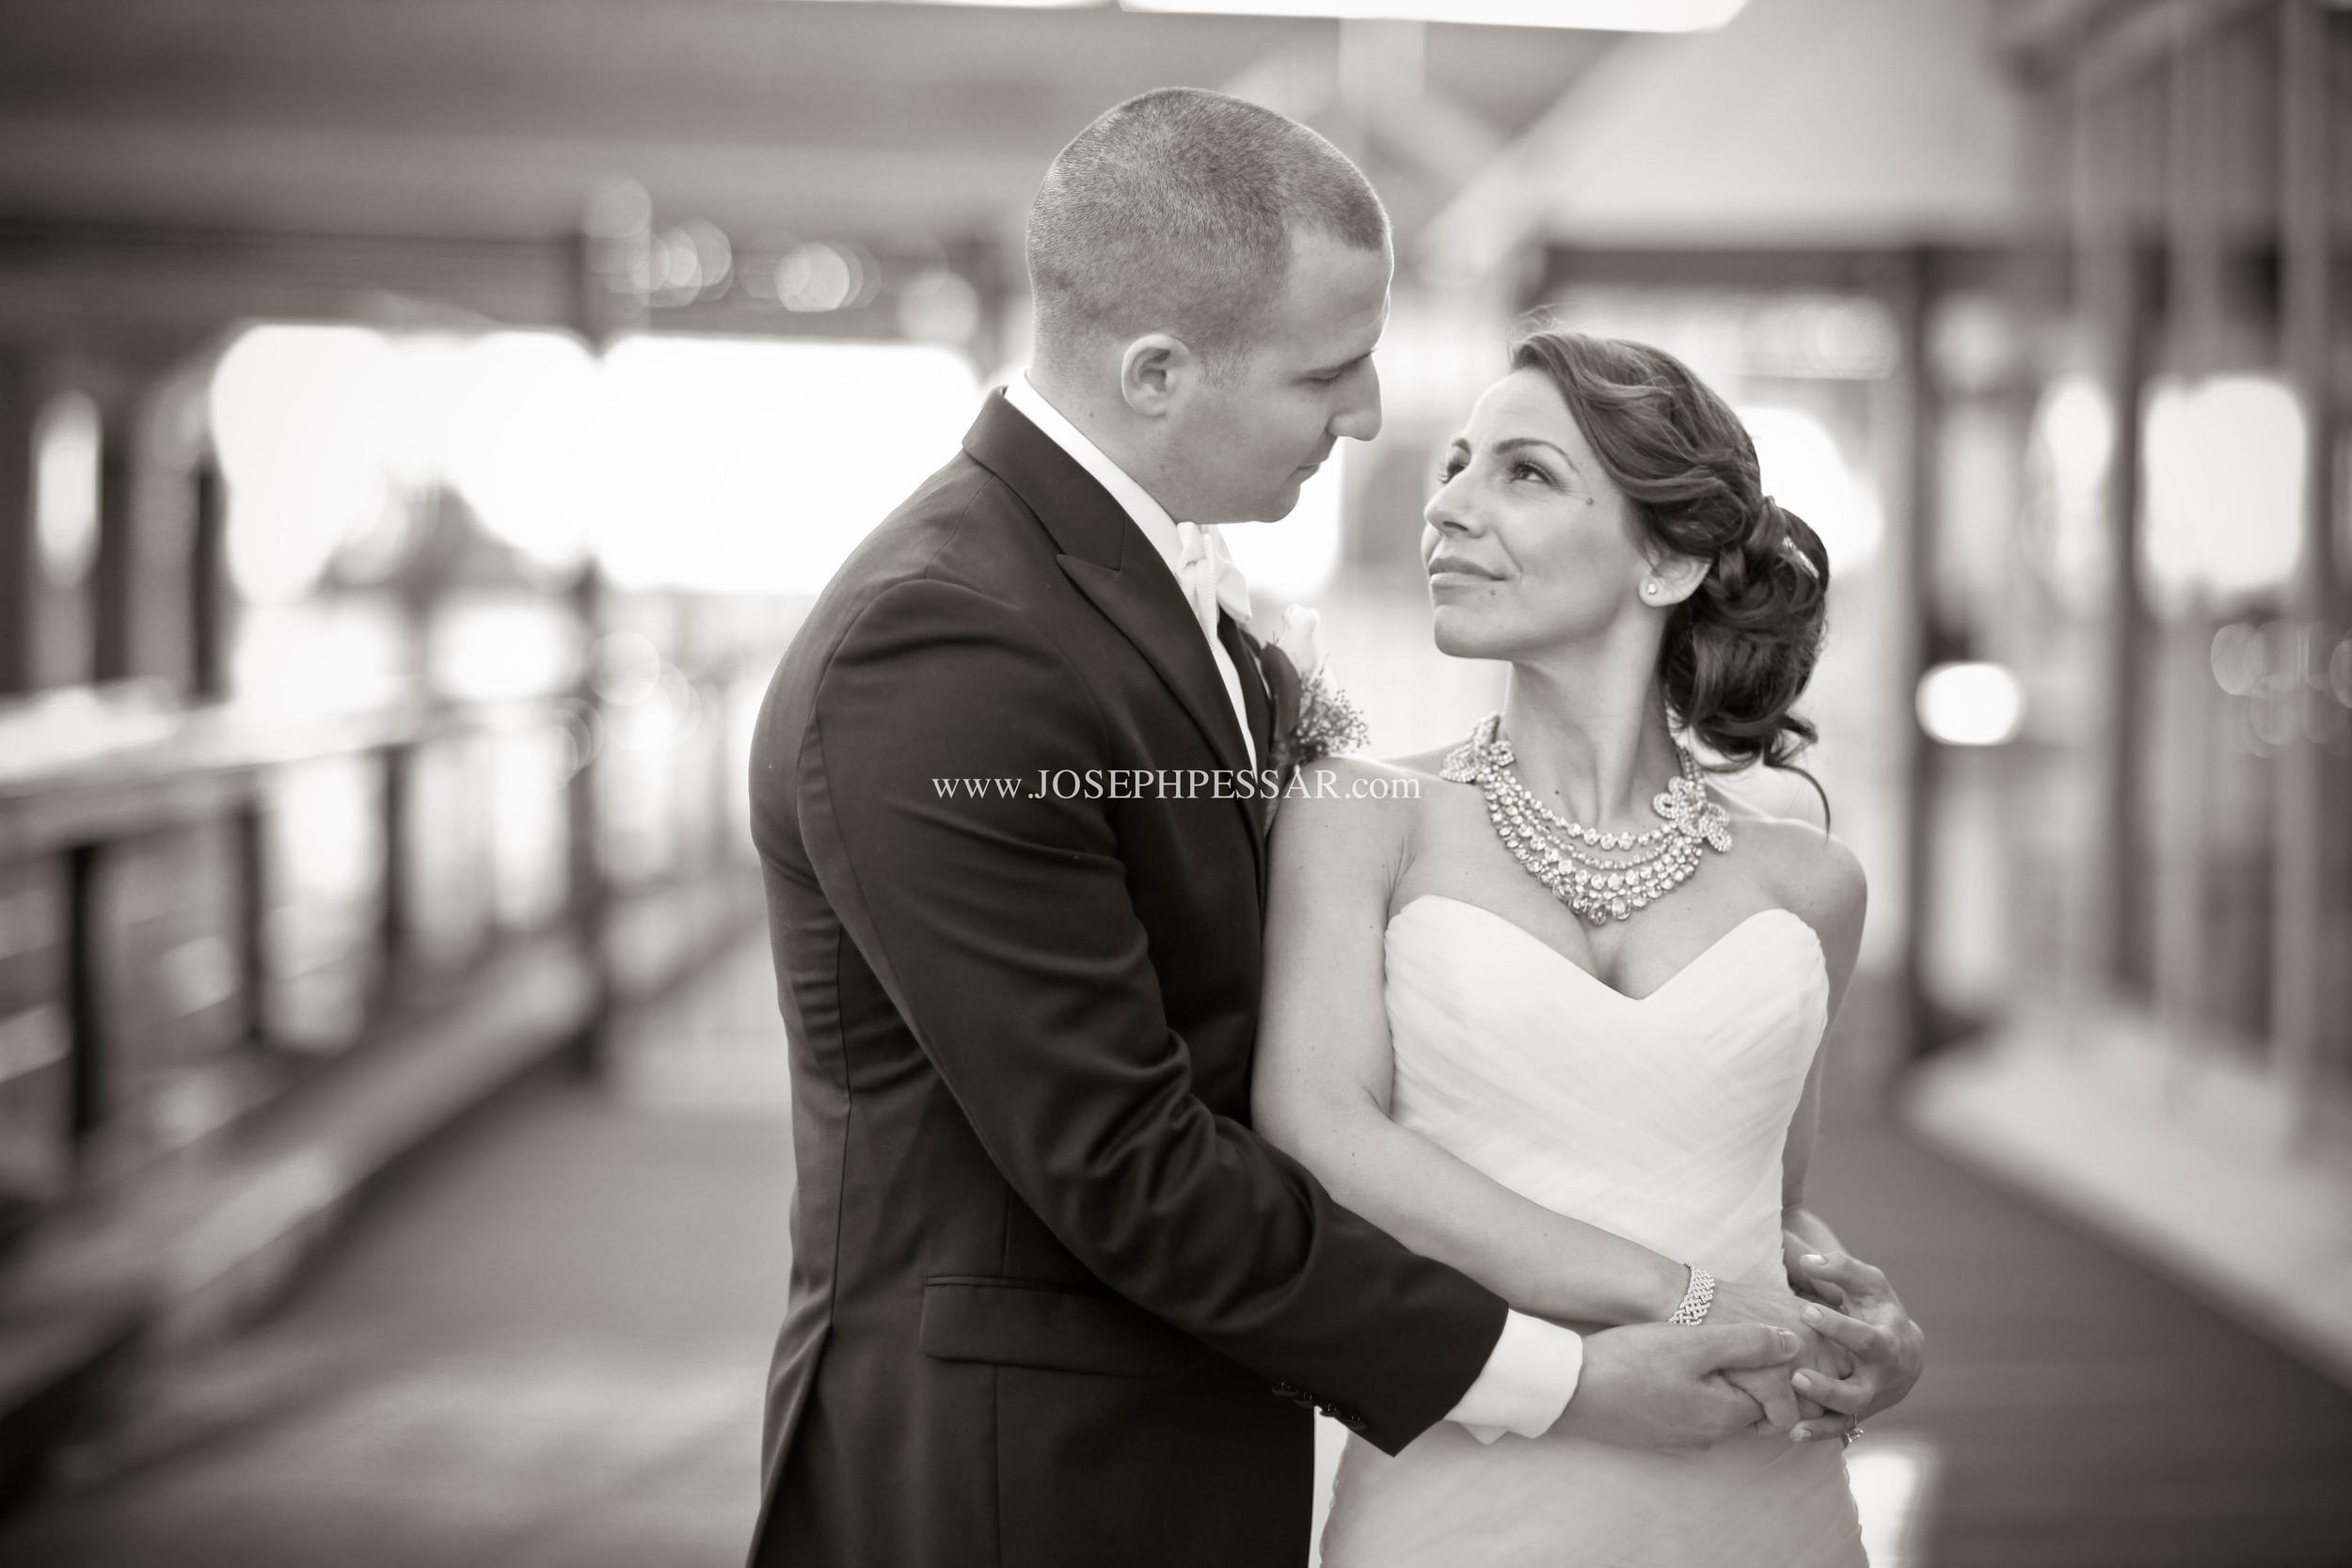 nyc_wedding_photographer0021.jpg